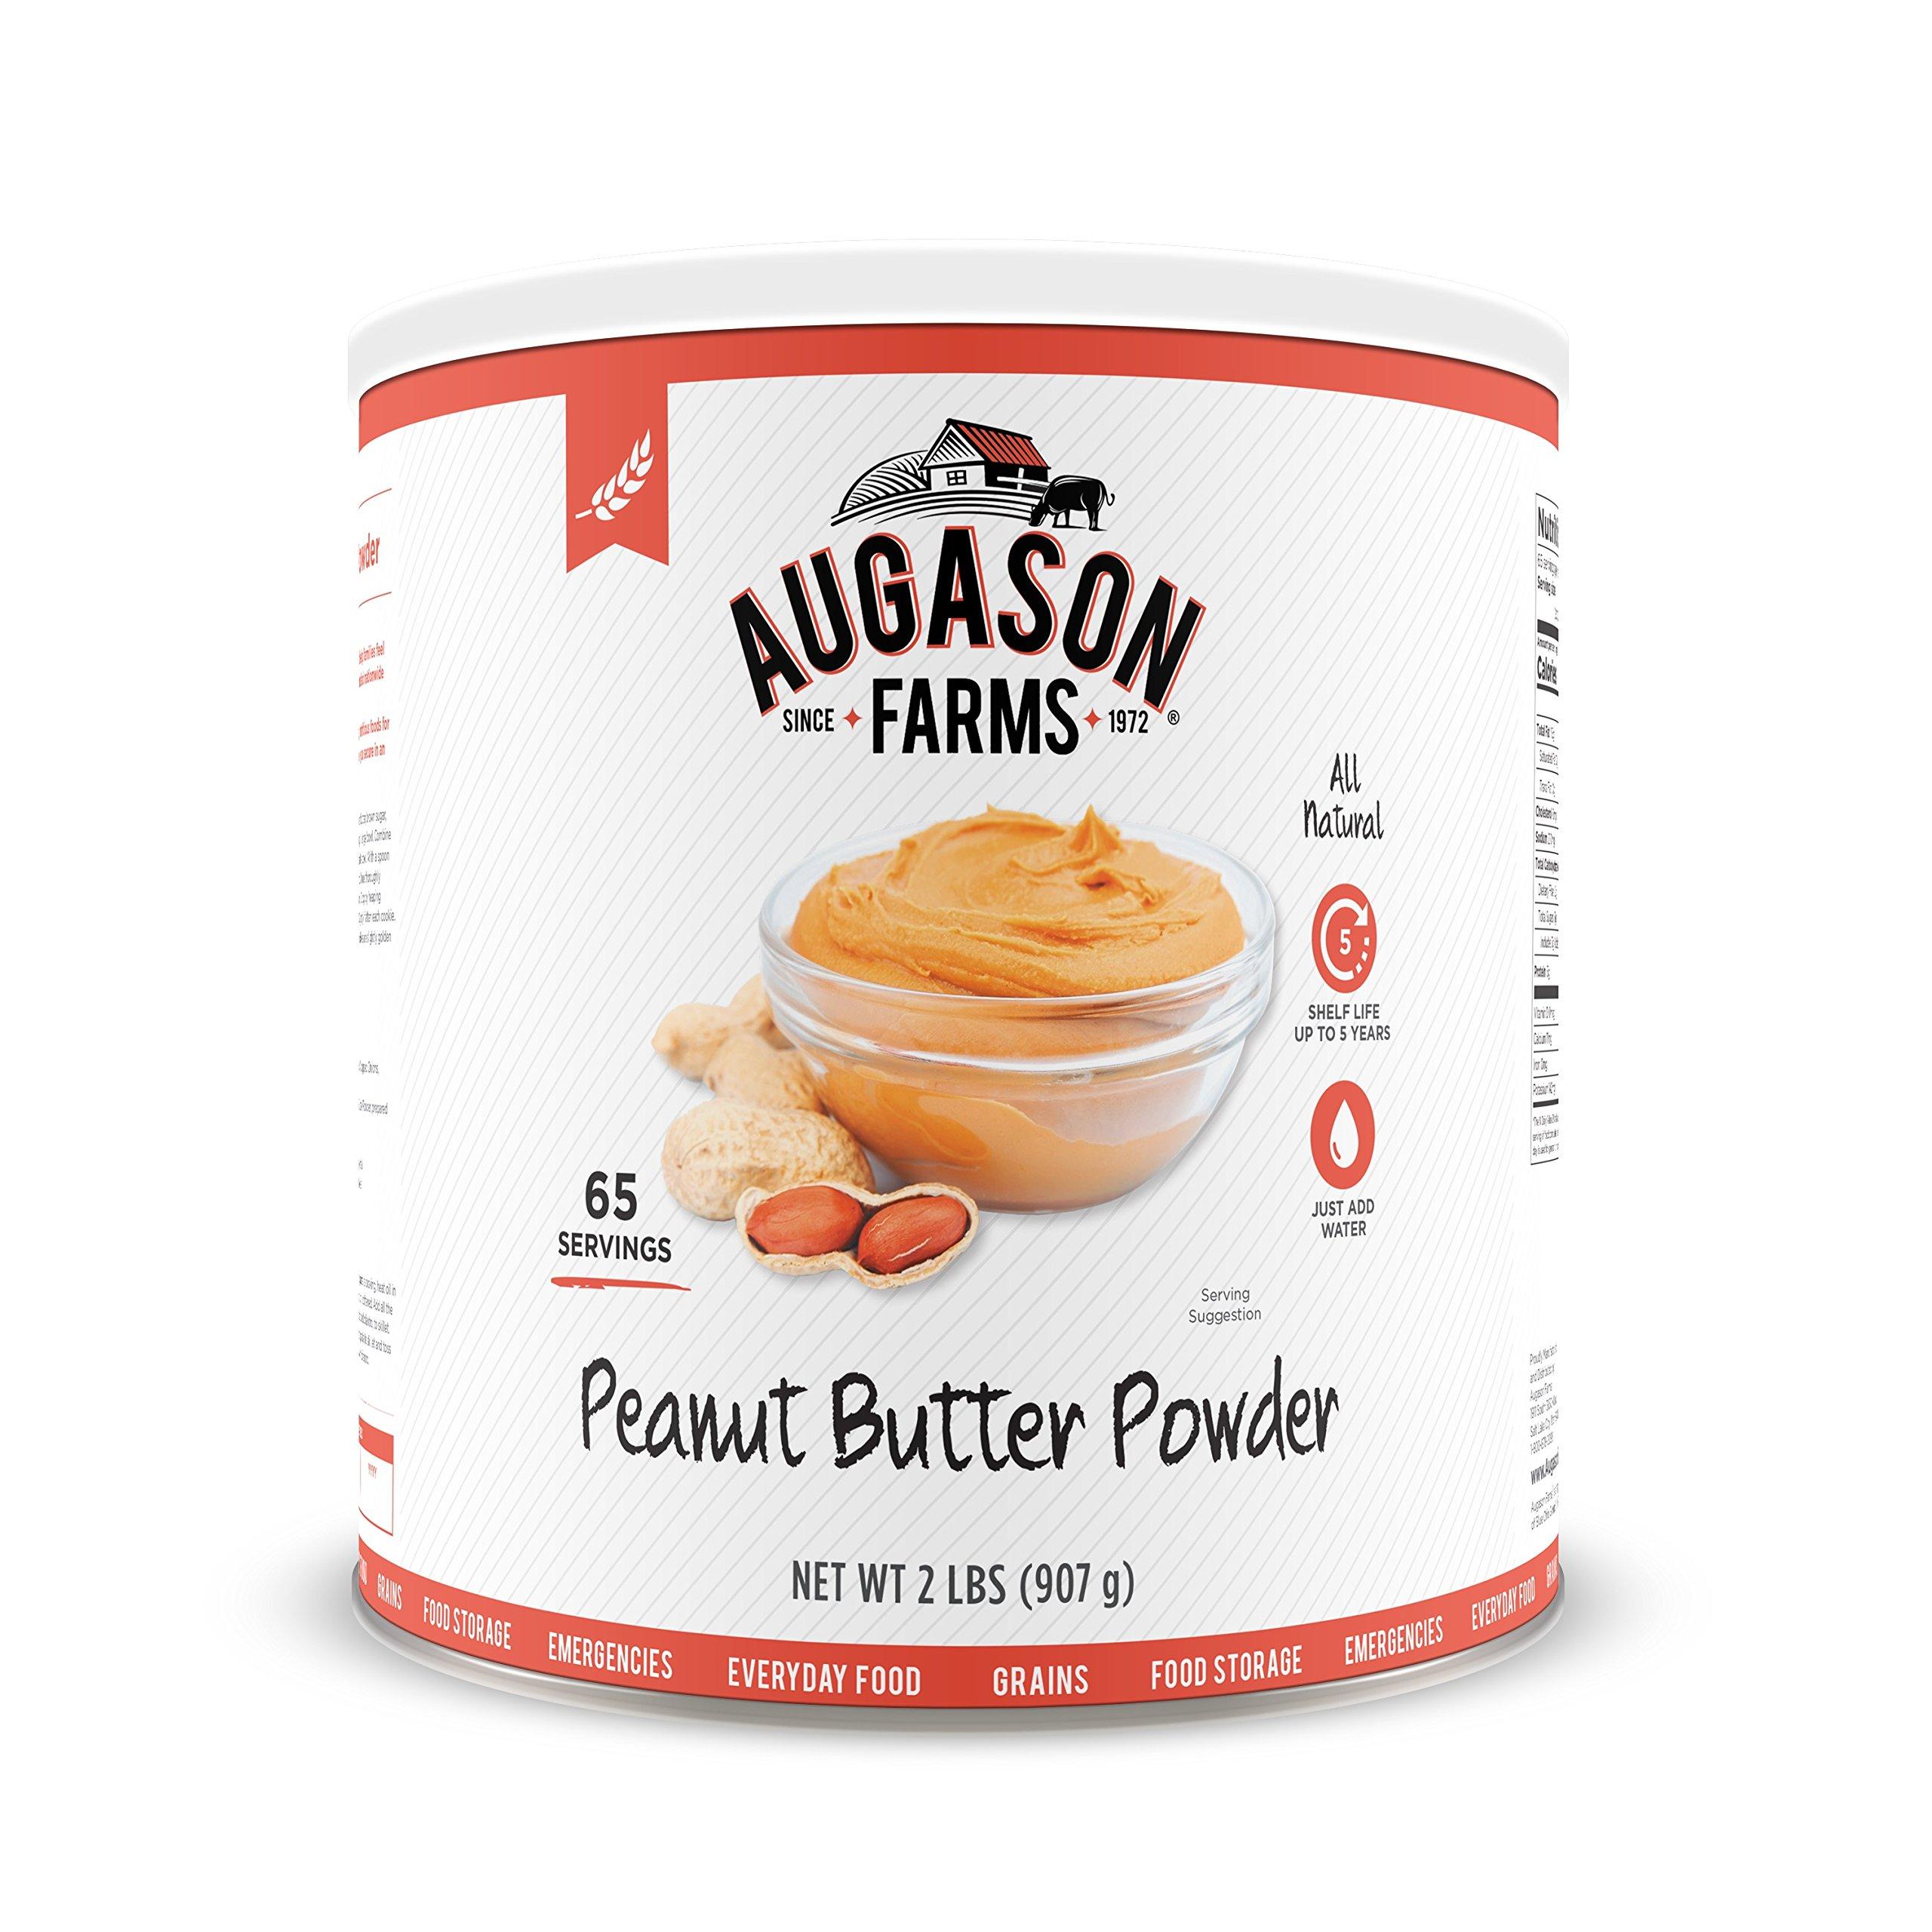 Augason Farms Peanut Butter Powder 2 lbs No. 10 Can by Augason Farms (Image #1)